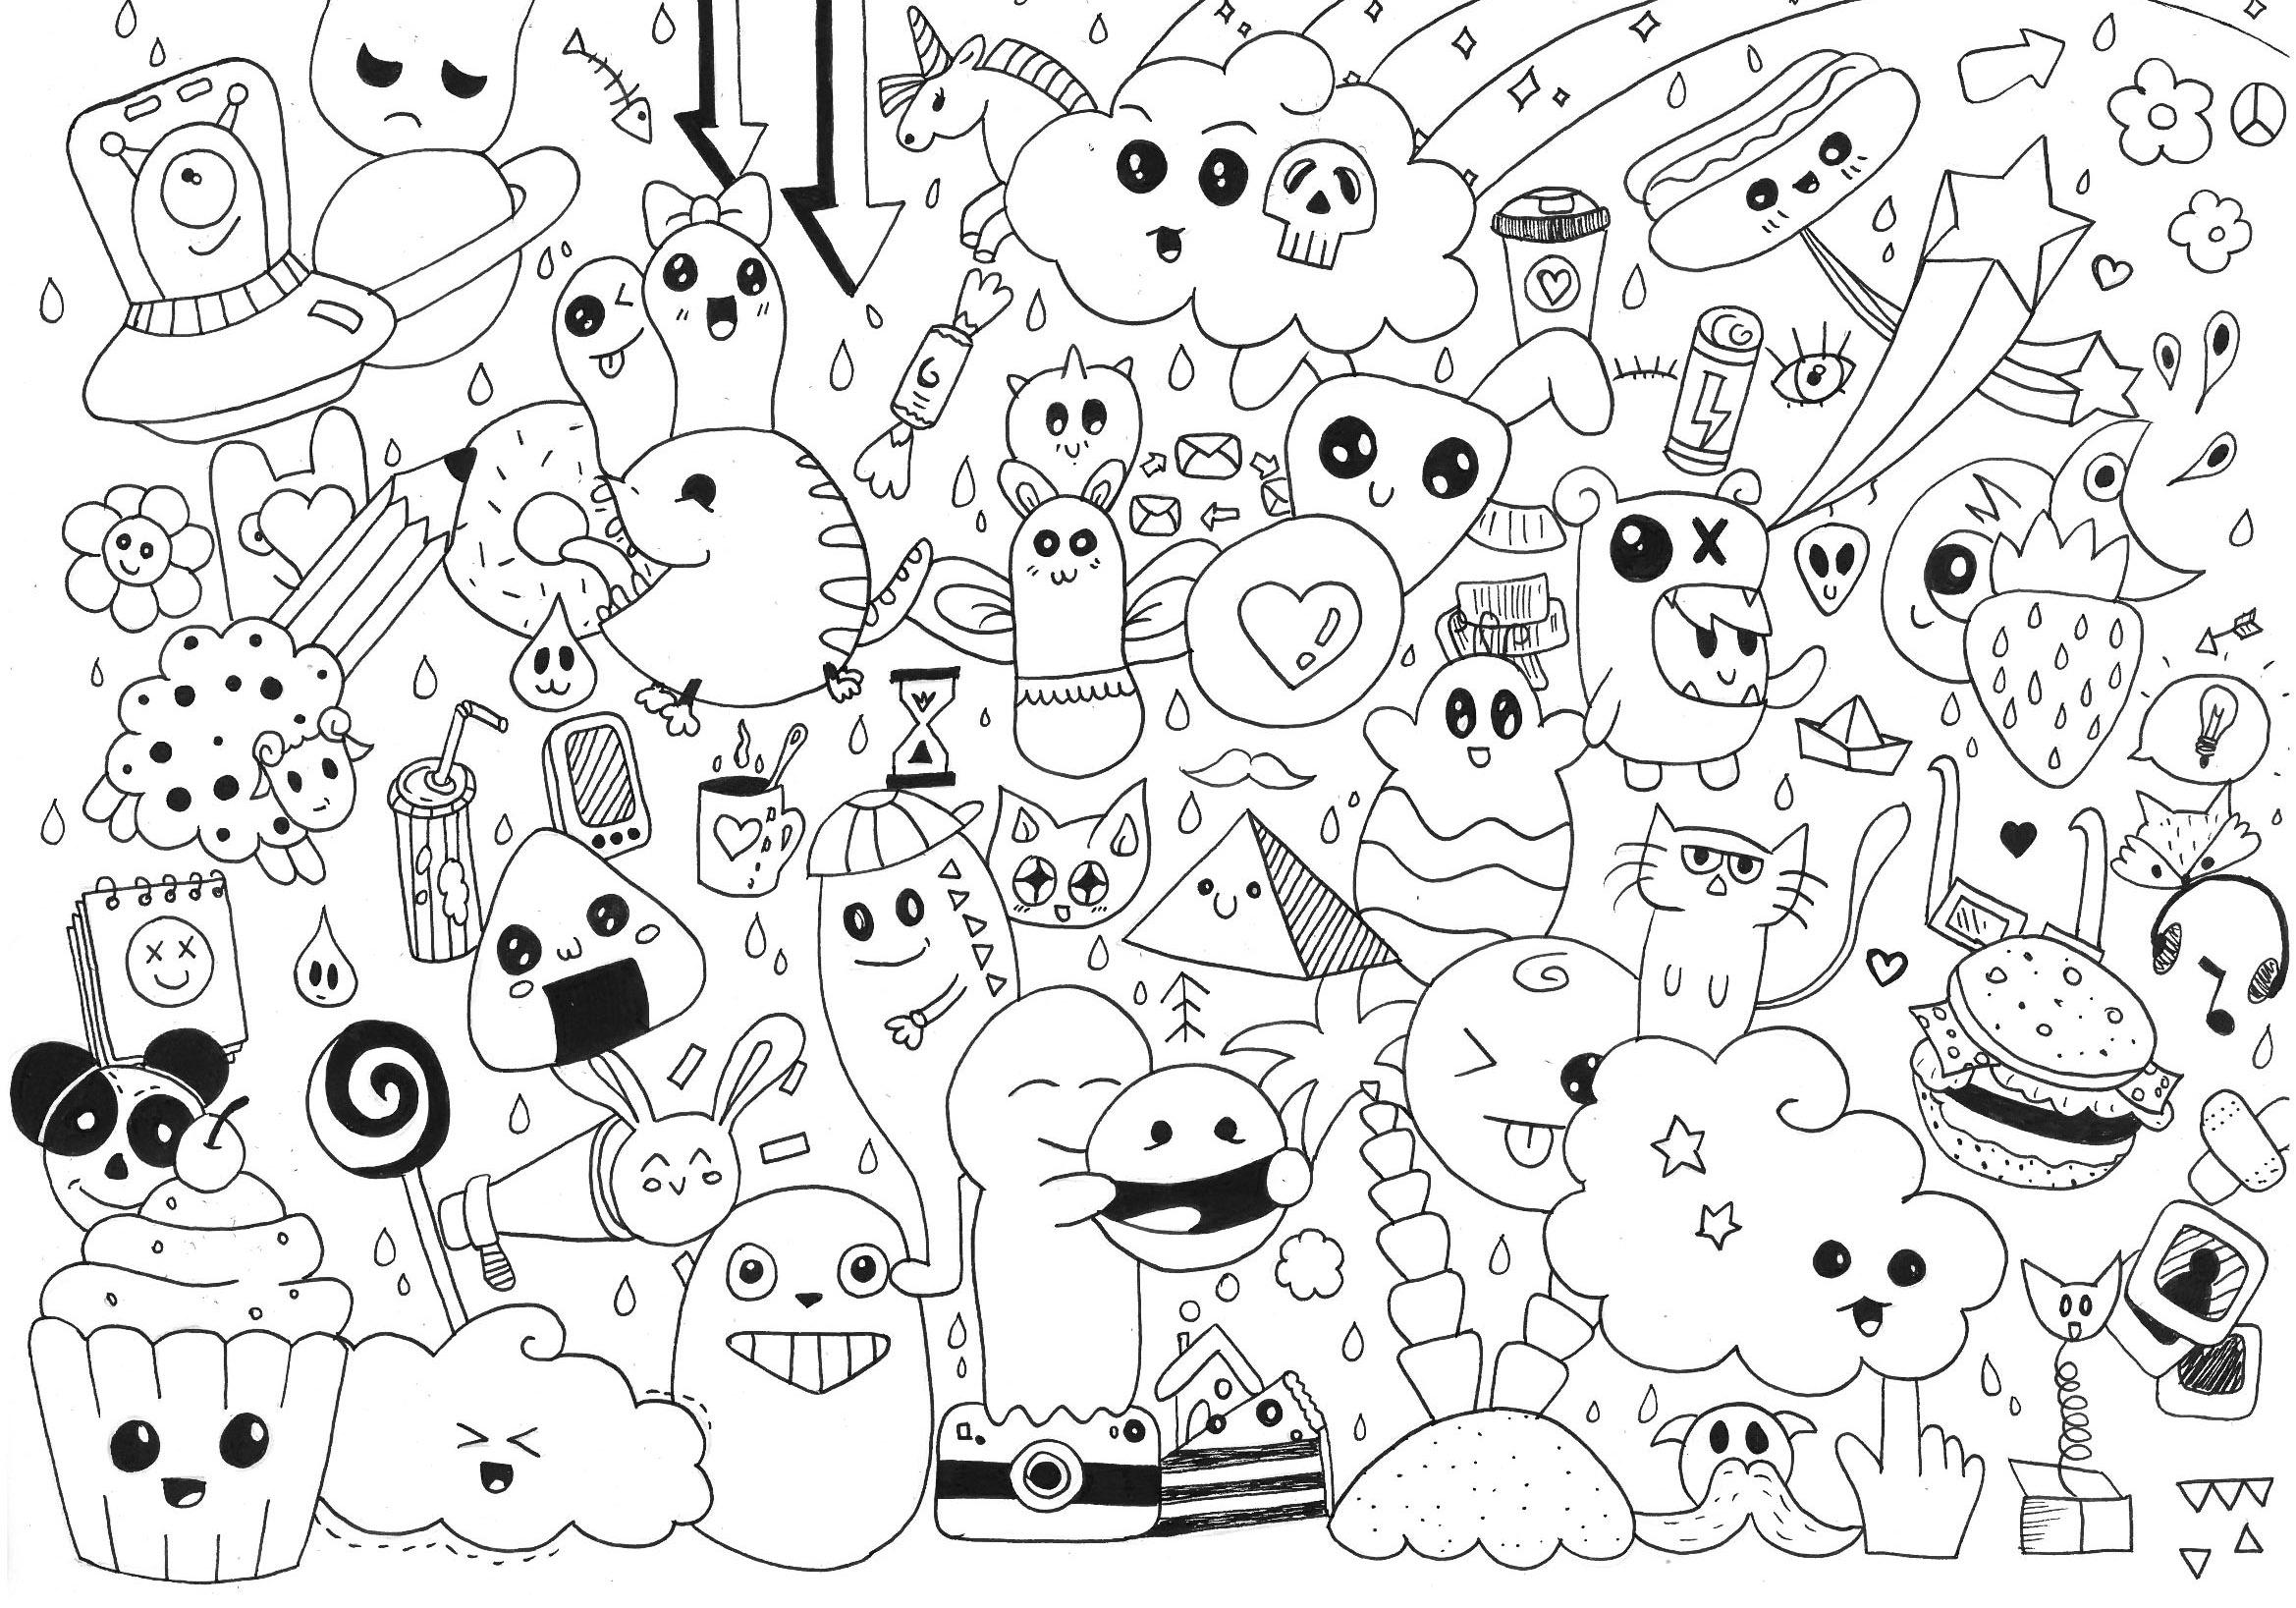 Doodle Rachel Doodling Doodle Art Coloring Pages For Adults